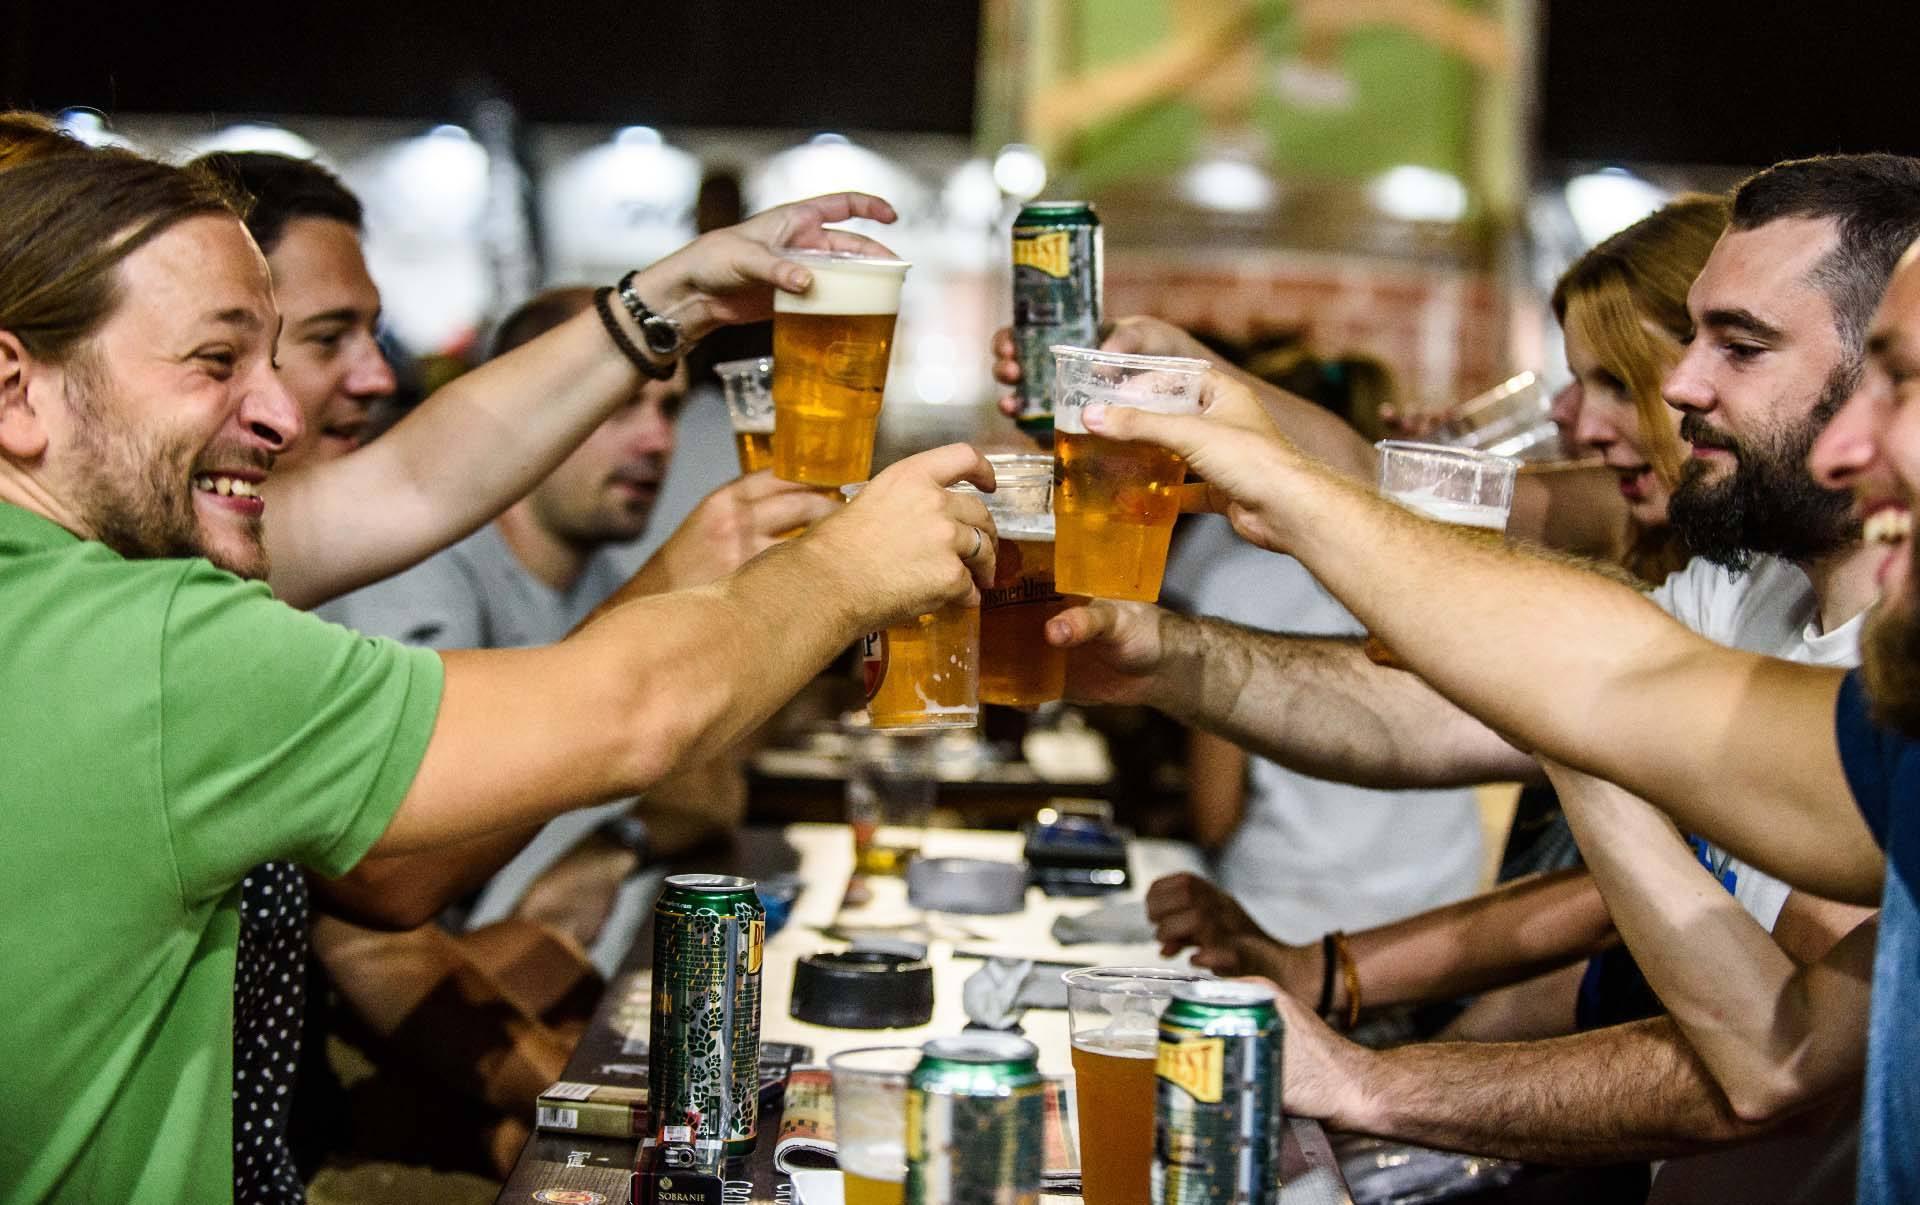 RAD's Guide to the Belgrade Beer Fest Program